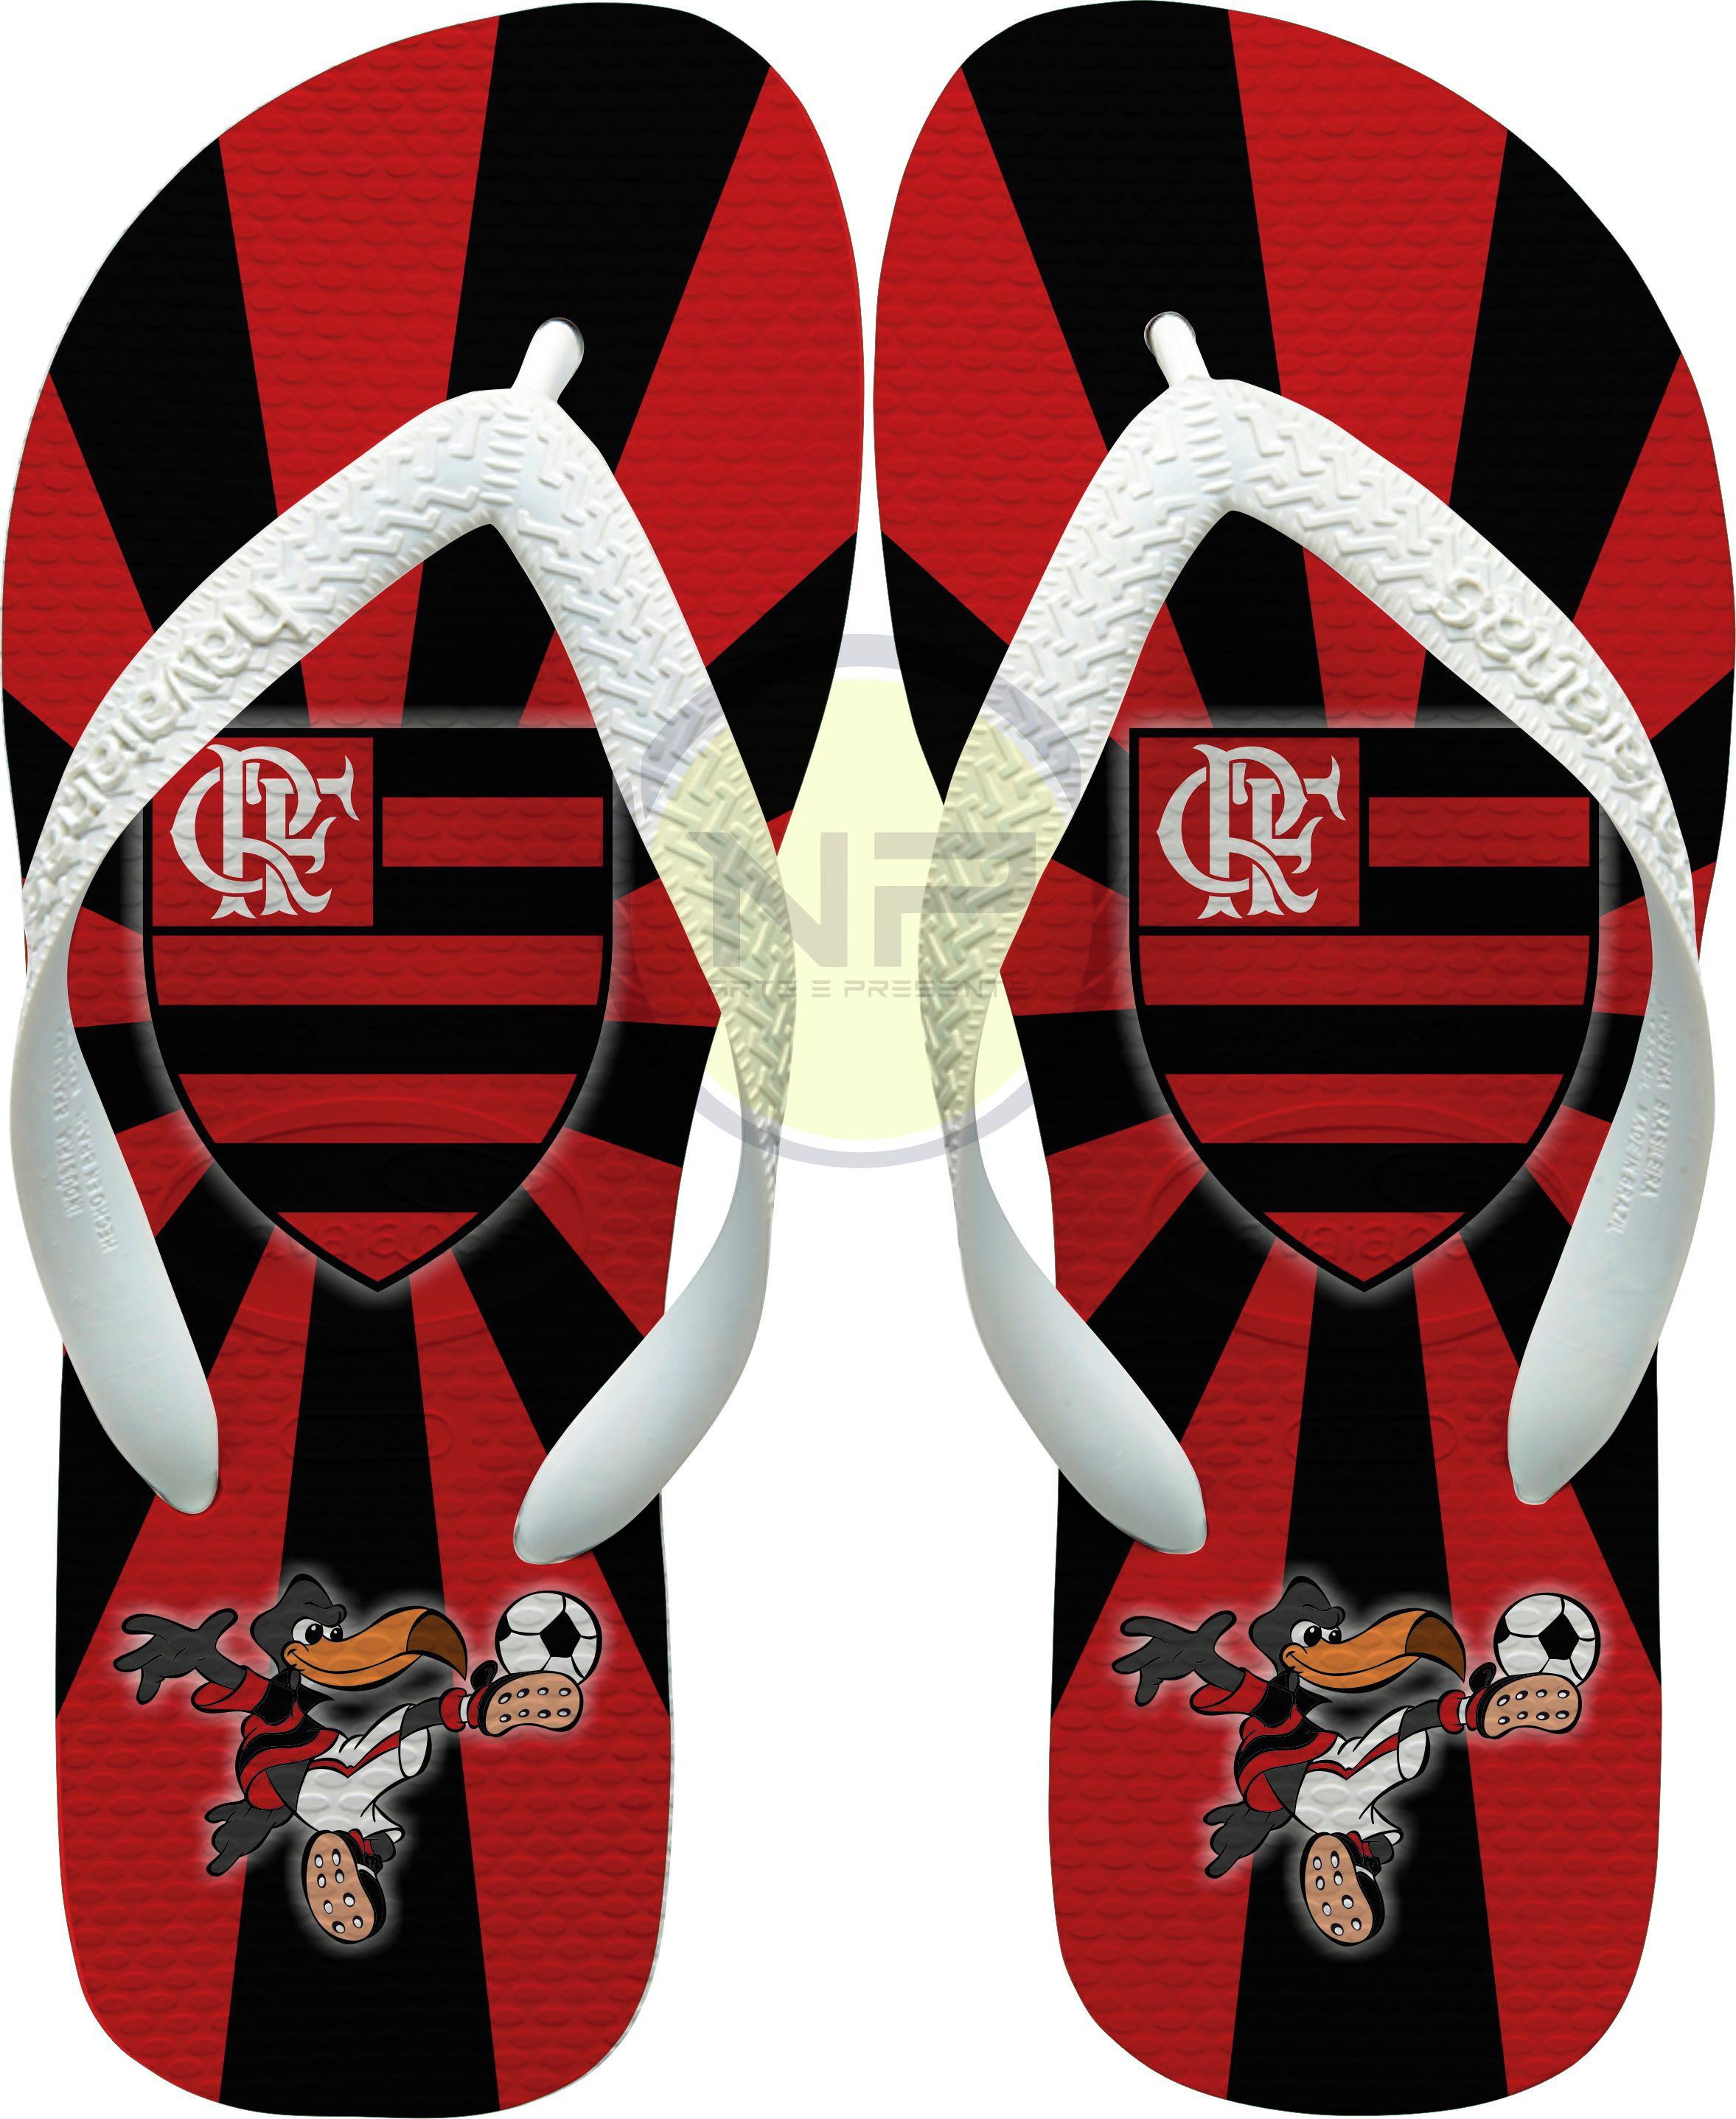 1820885a251388 Chinelo Havaianas Personalizado Flamengo - Mascote